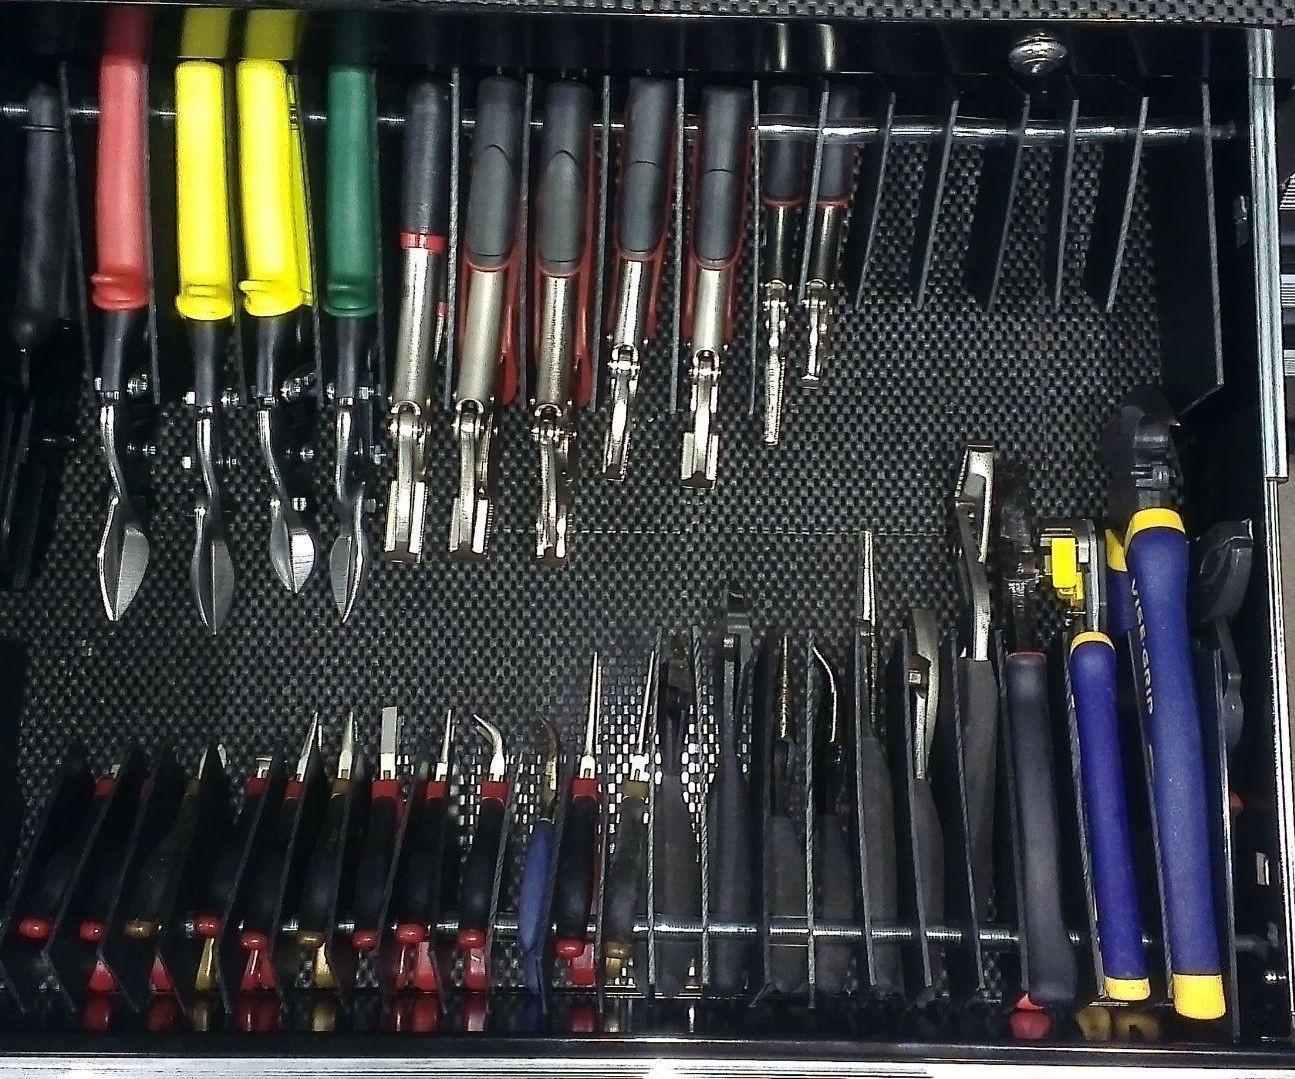 Best ideas about DIY Plier Organizer . Save or Pin Pliers Organizer 7 Now.